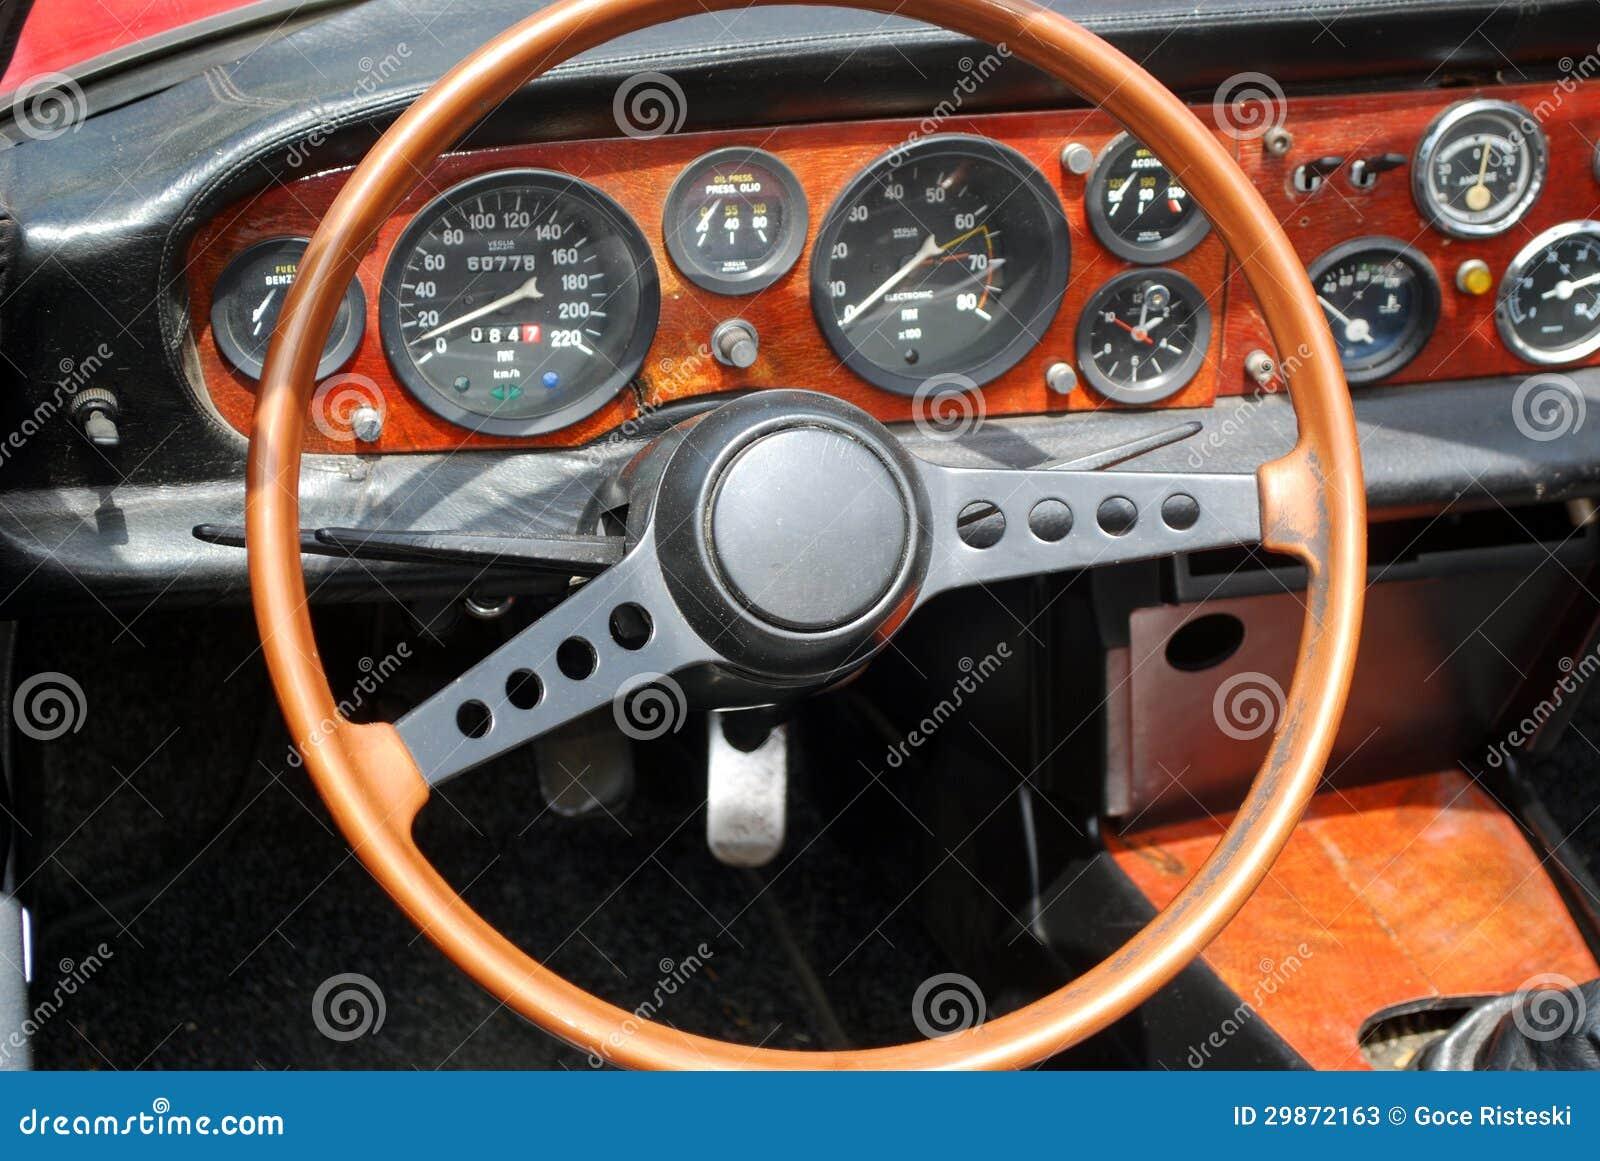 Car Parts / Partes del Coche / Partes del Carro | SpanishDict Answers